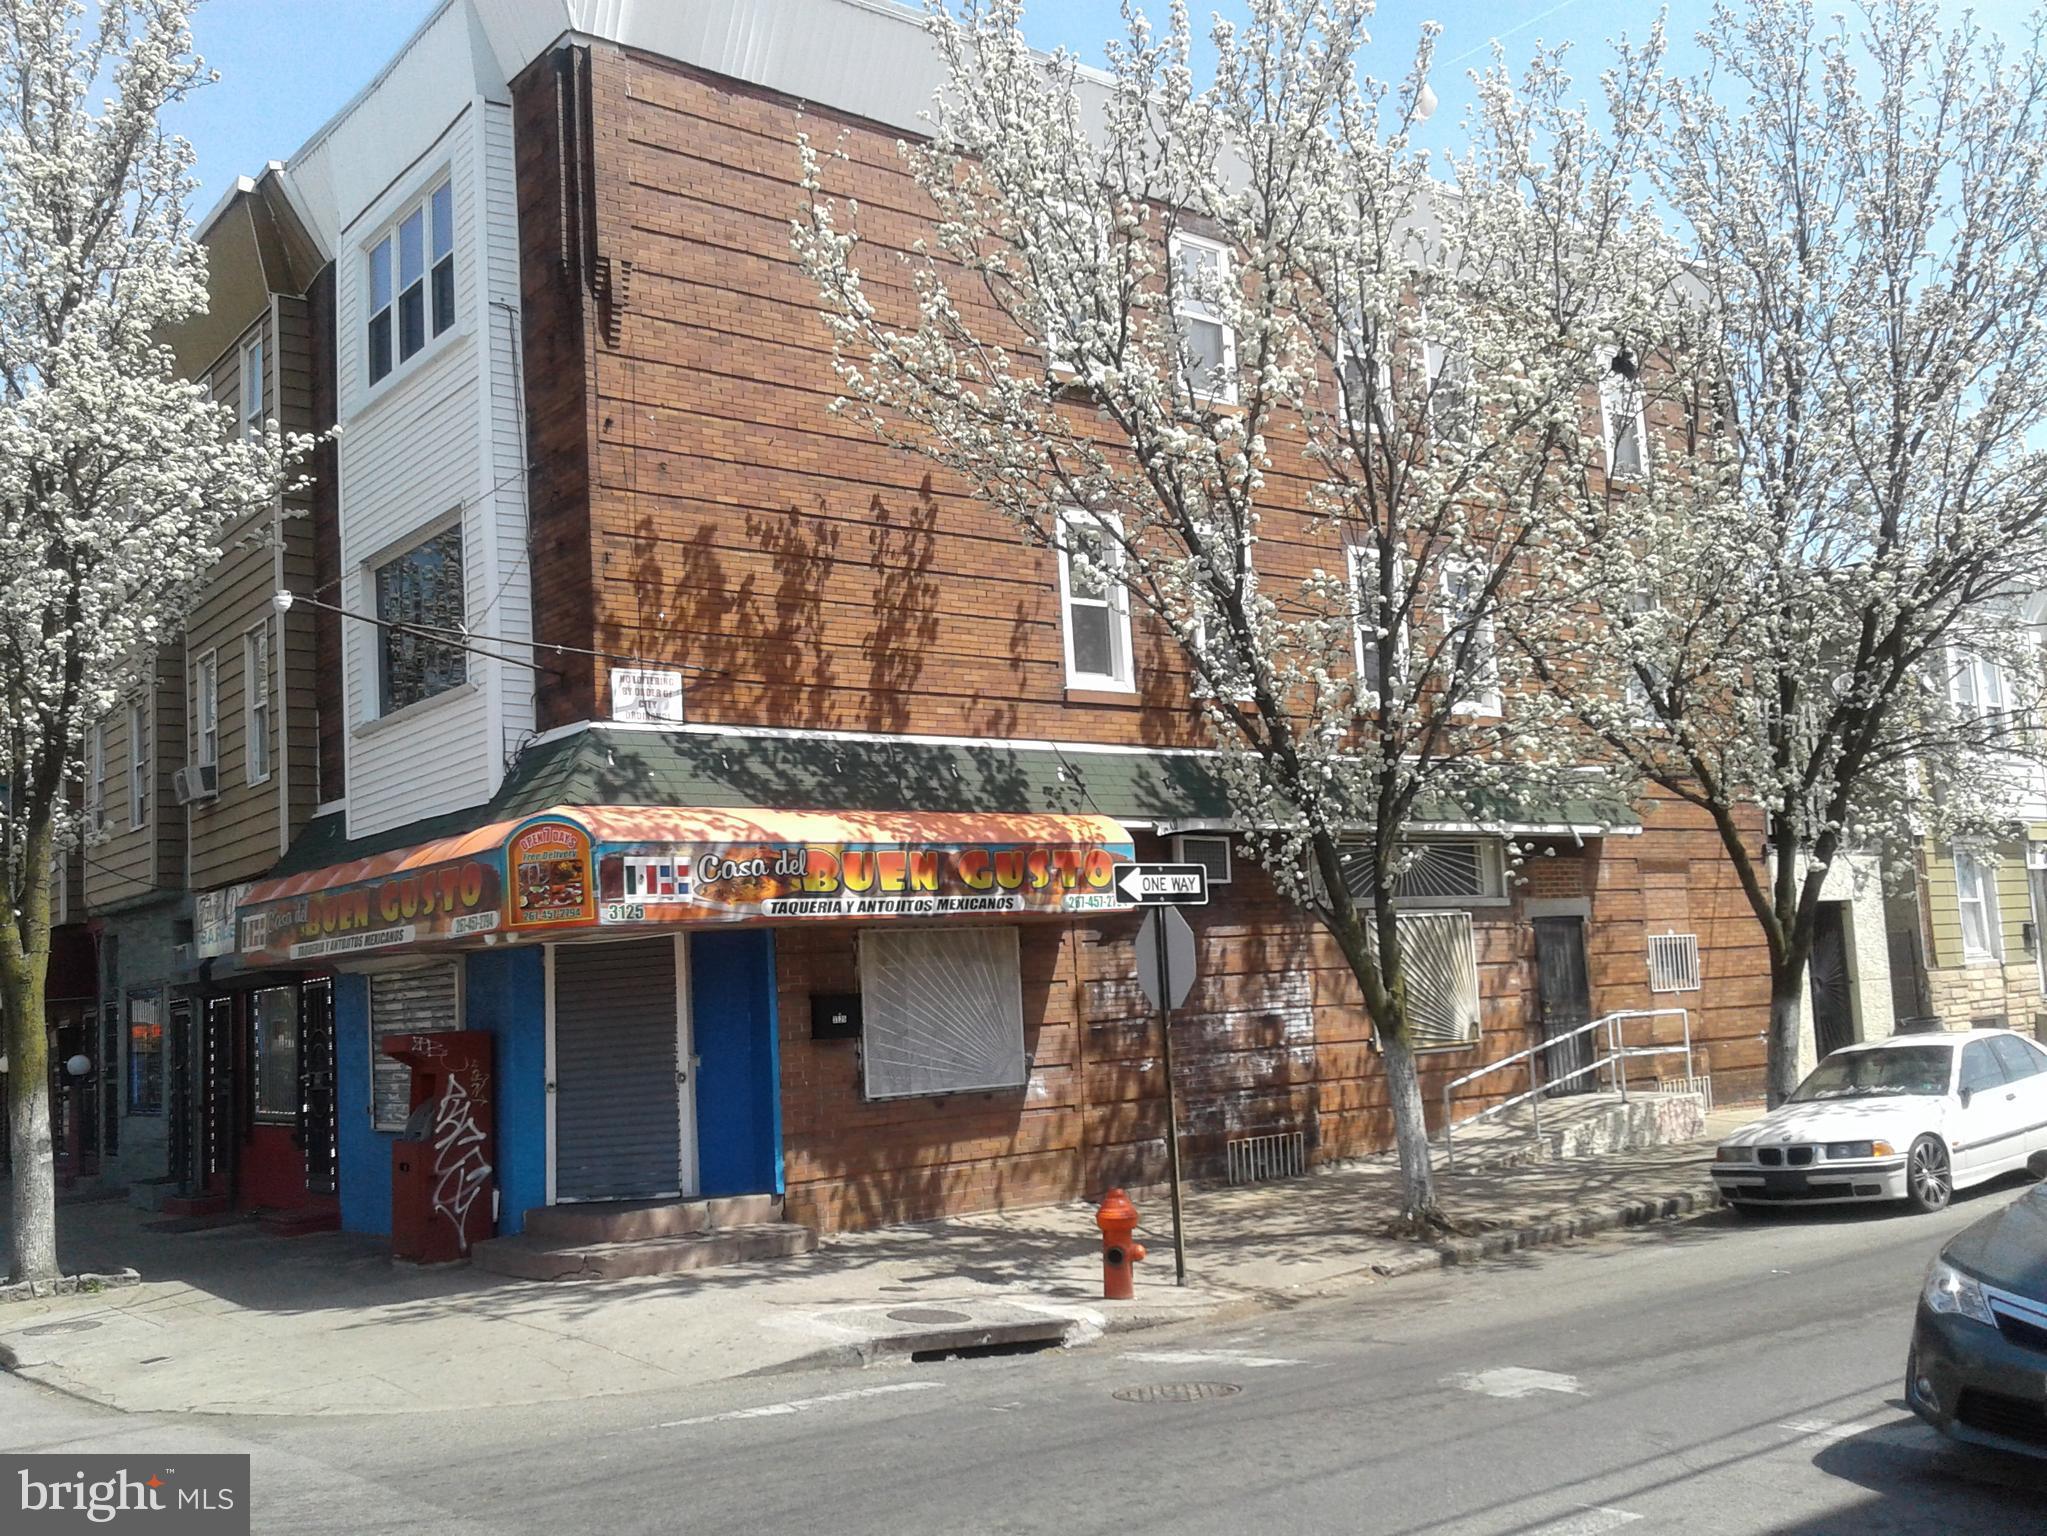 3125 N FRONT STREET, PHILADELPHIA, PA 19133